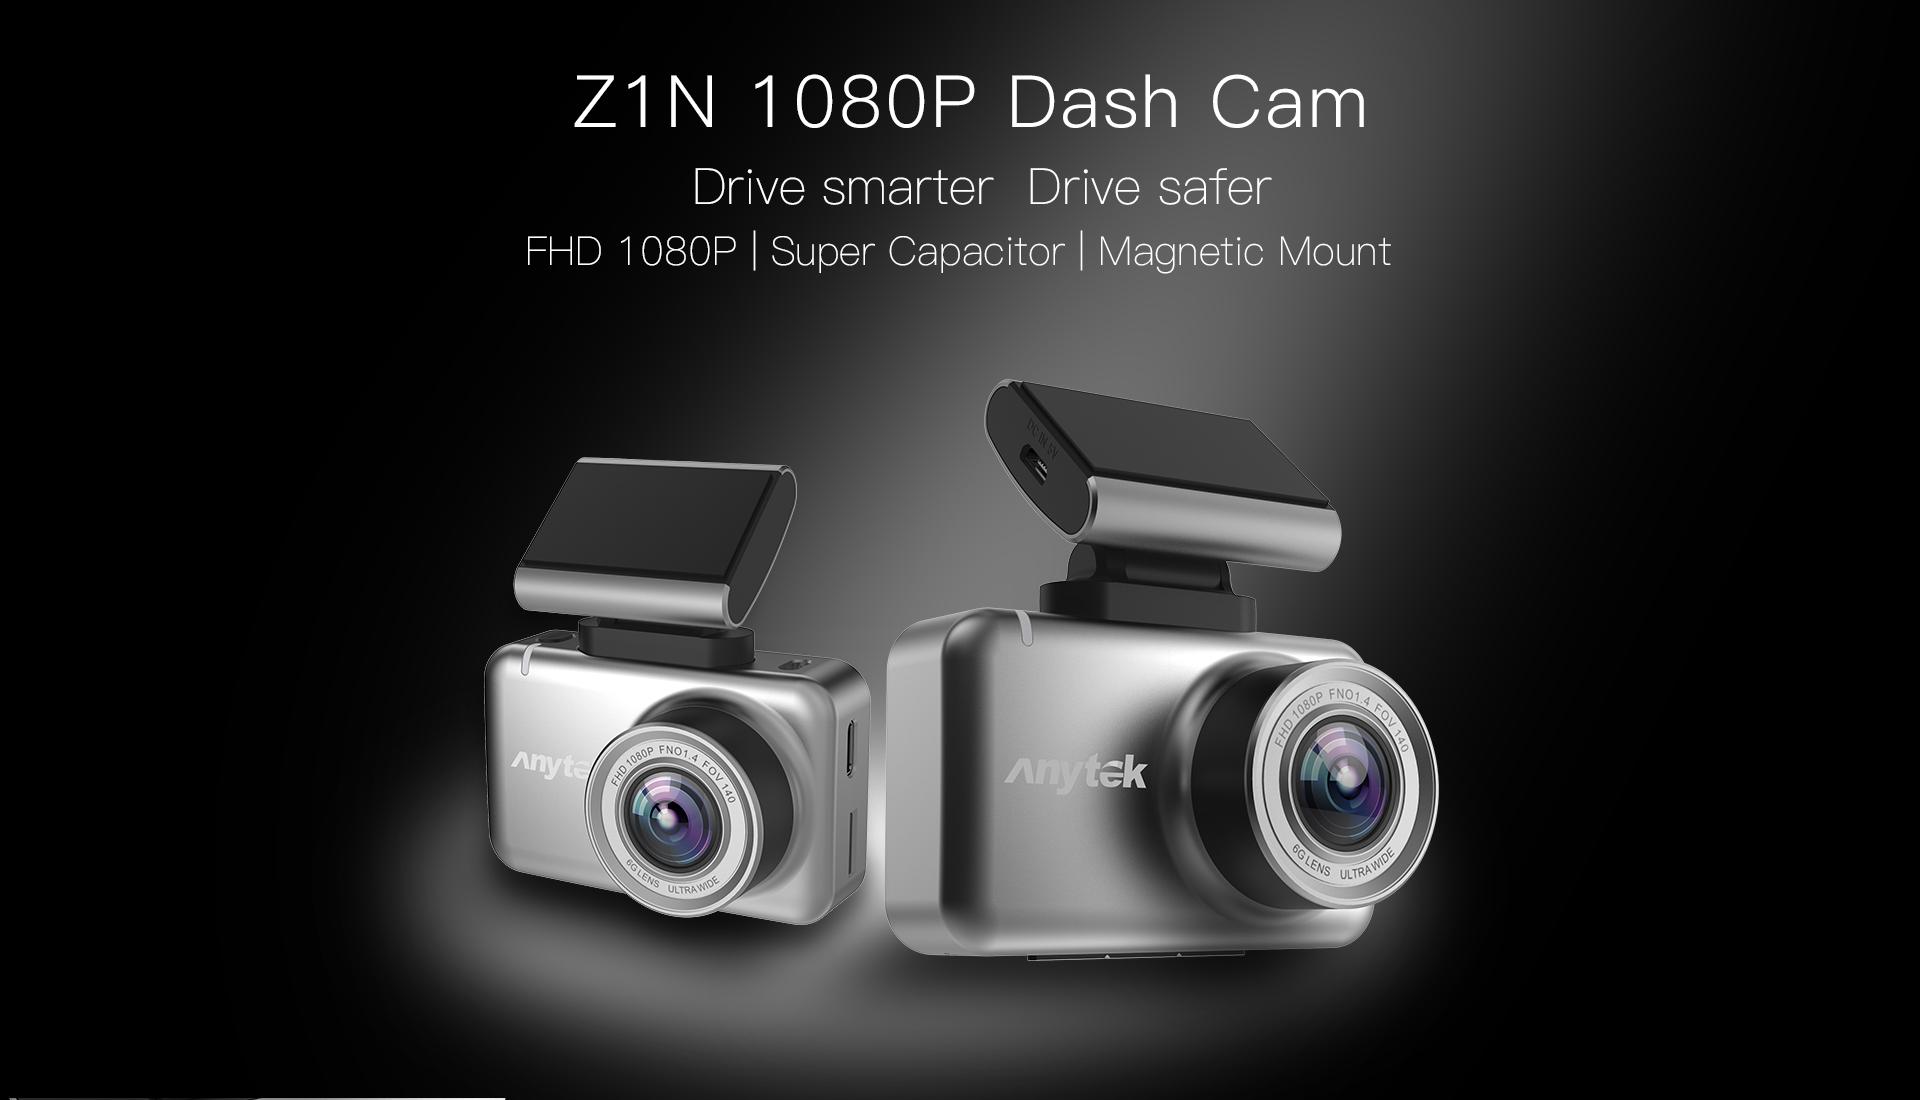 Anytek 2.35inch IPS Touch Screen Car Dash Cam Super Capacitor Dash Cam 1080p Z1N Night Version